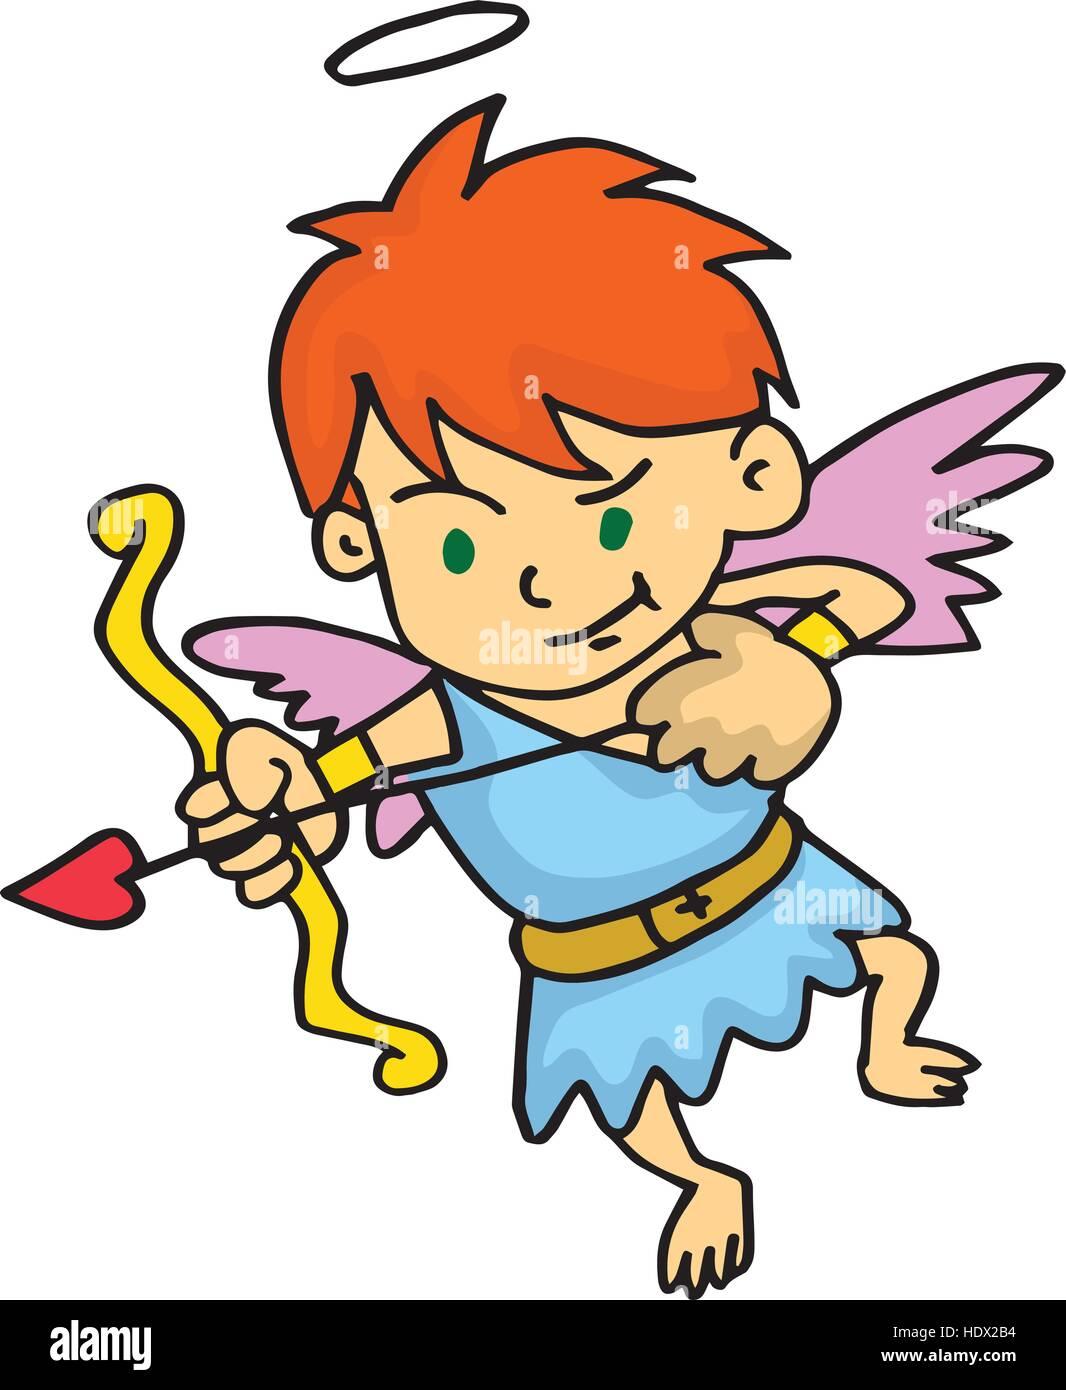 Cupid aiming at something cartoon vector - Stock Vector